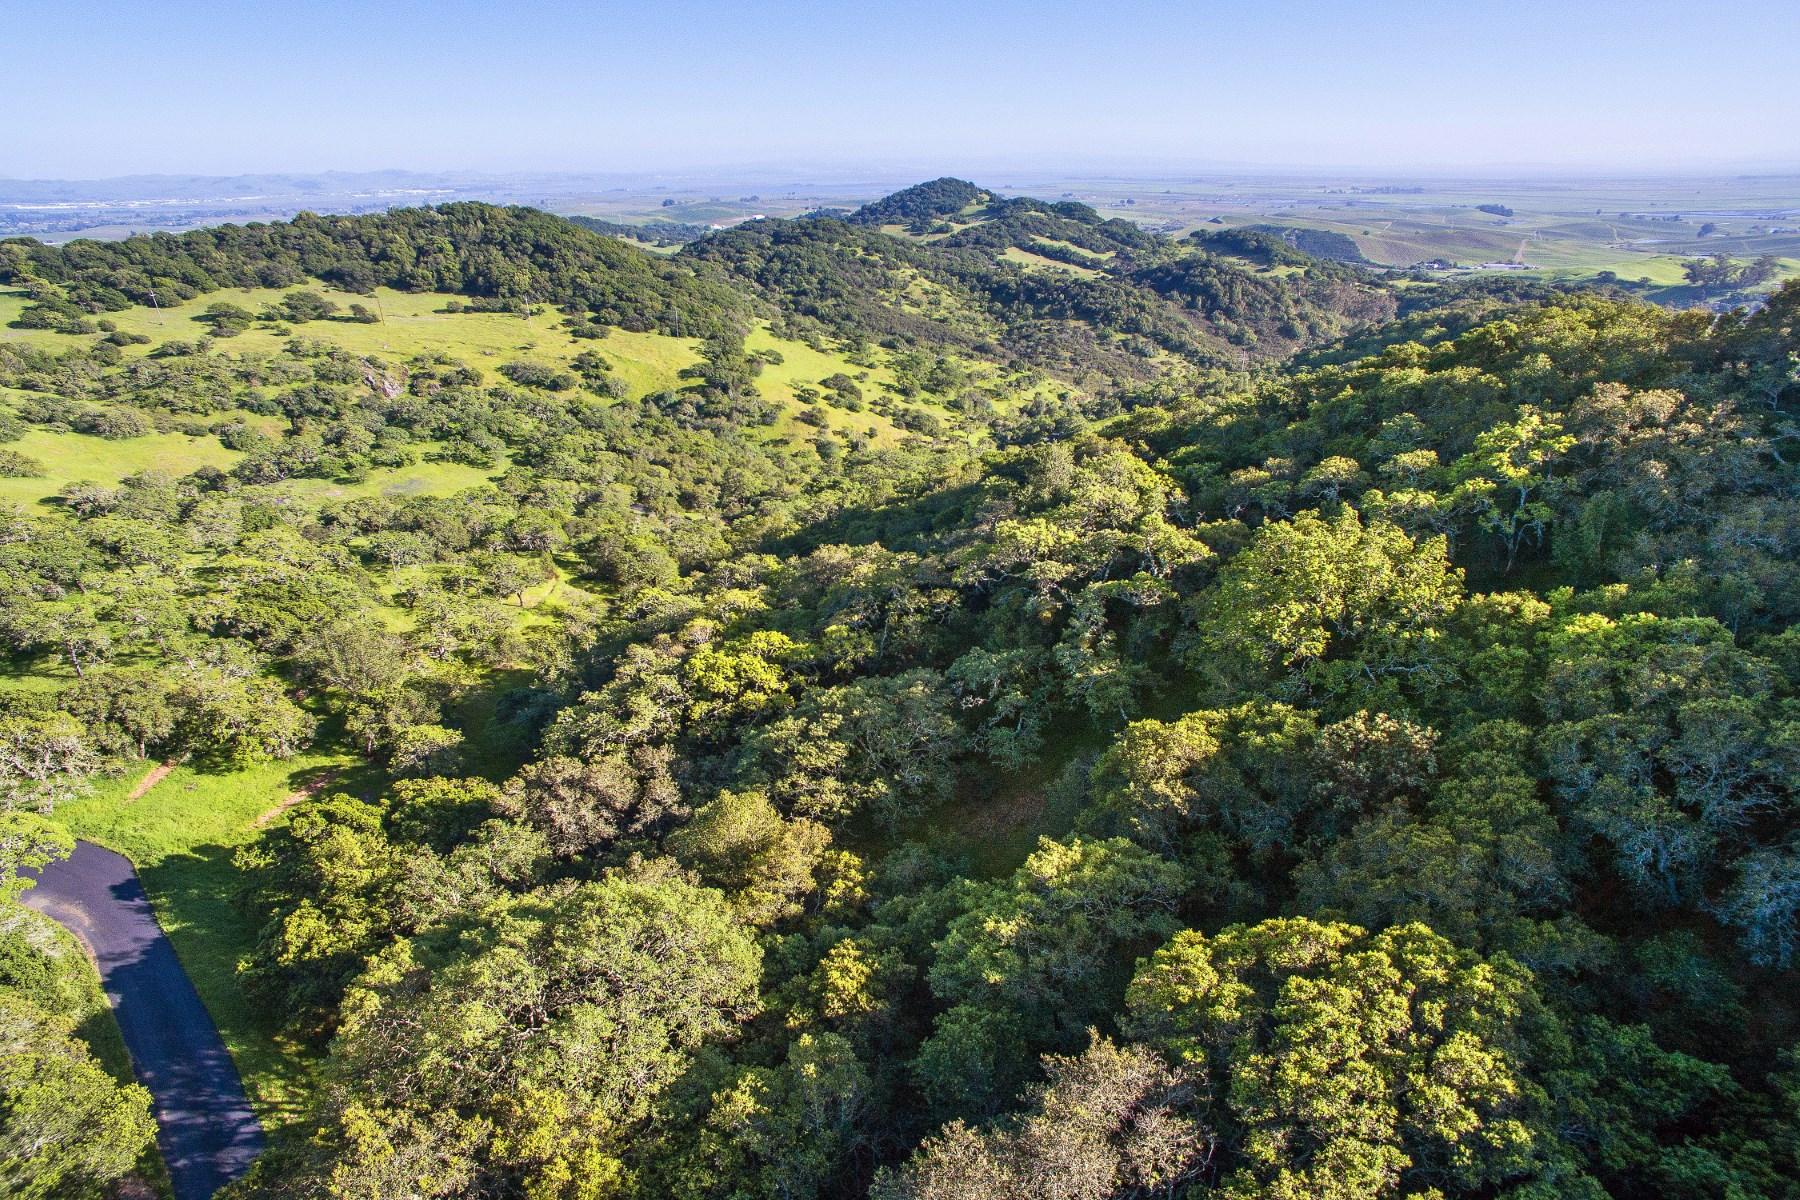 Moradia para Venda às Over 10 Acres of Exceptional Level Land 19292 Arrowhead Mountain Rd. Sonoma, Califórnia, 95476 Estados Unidos